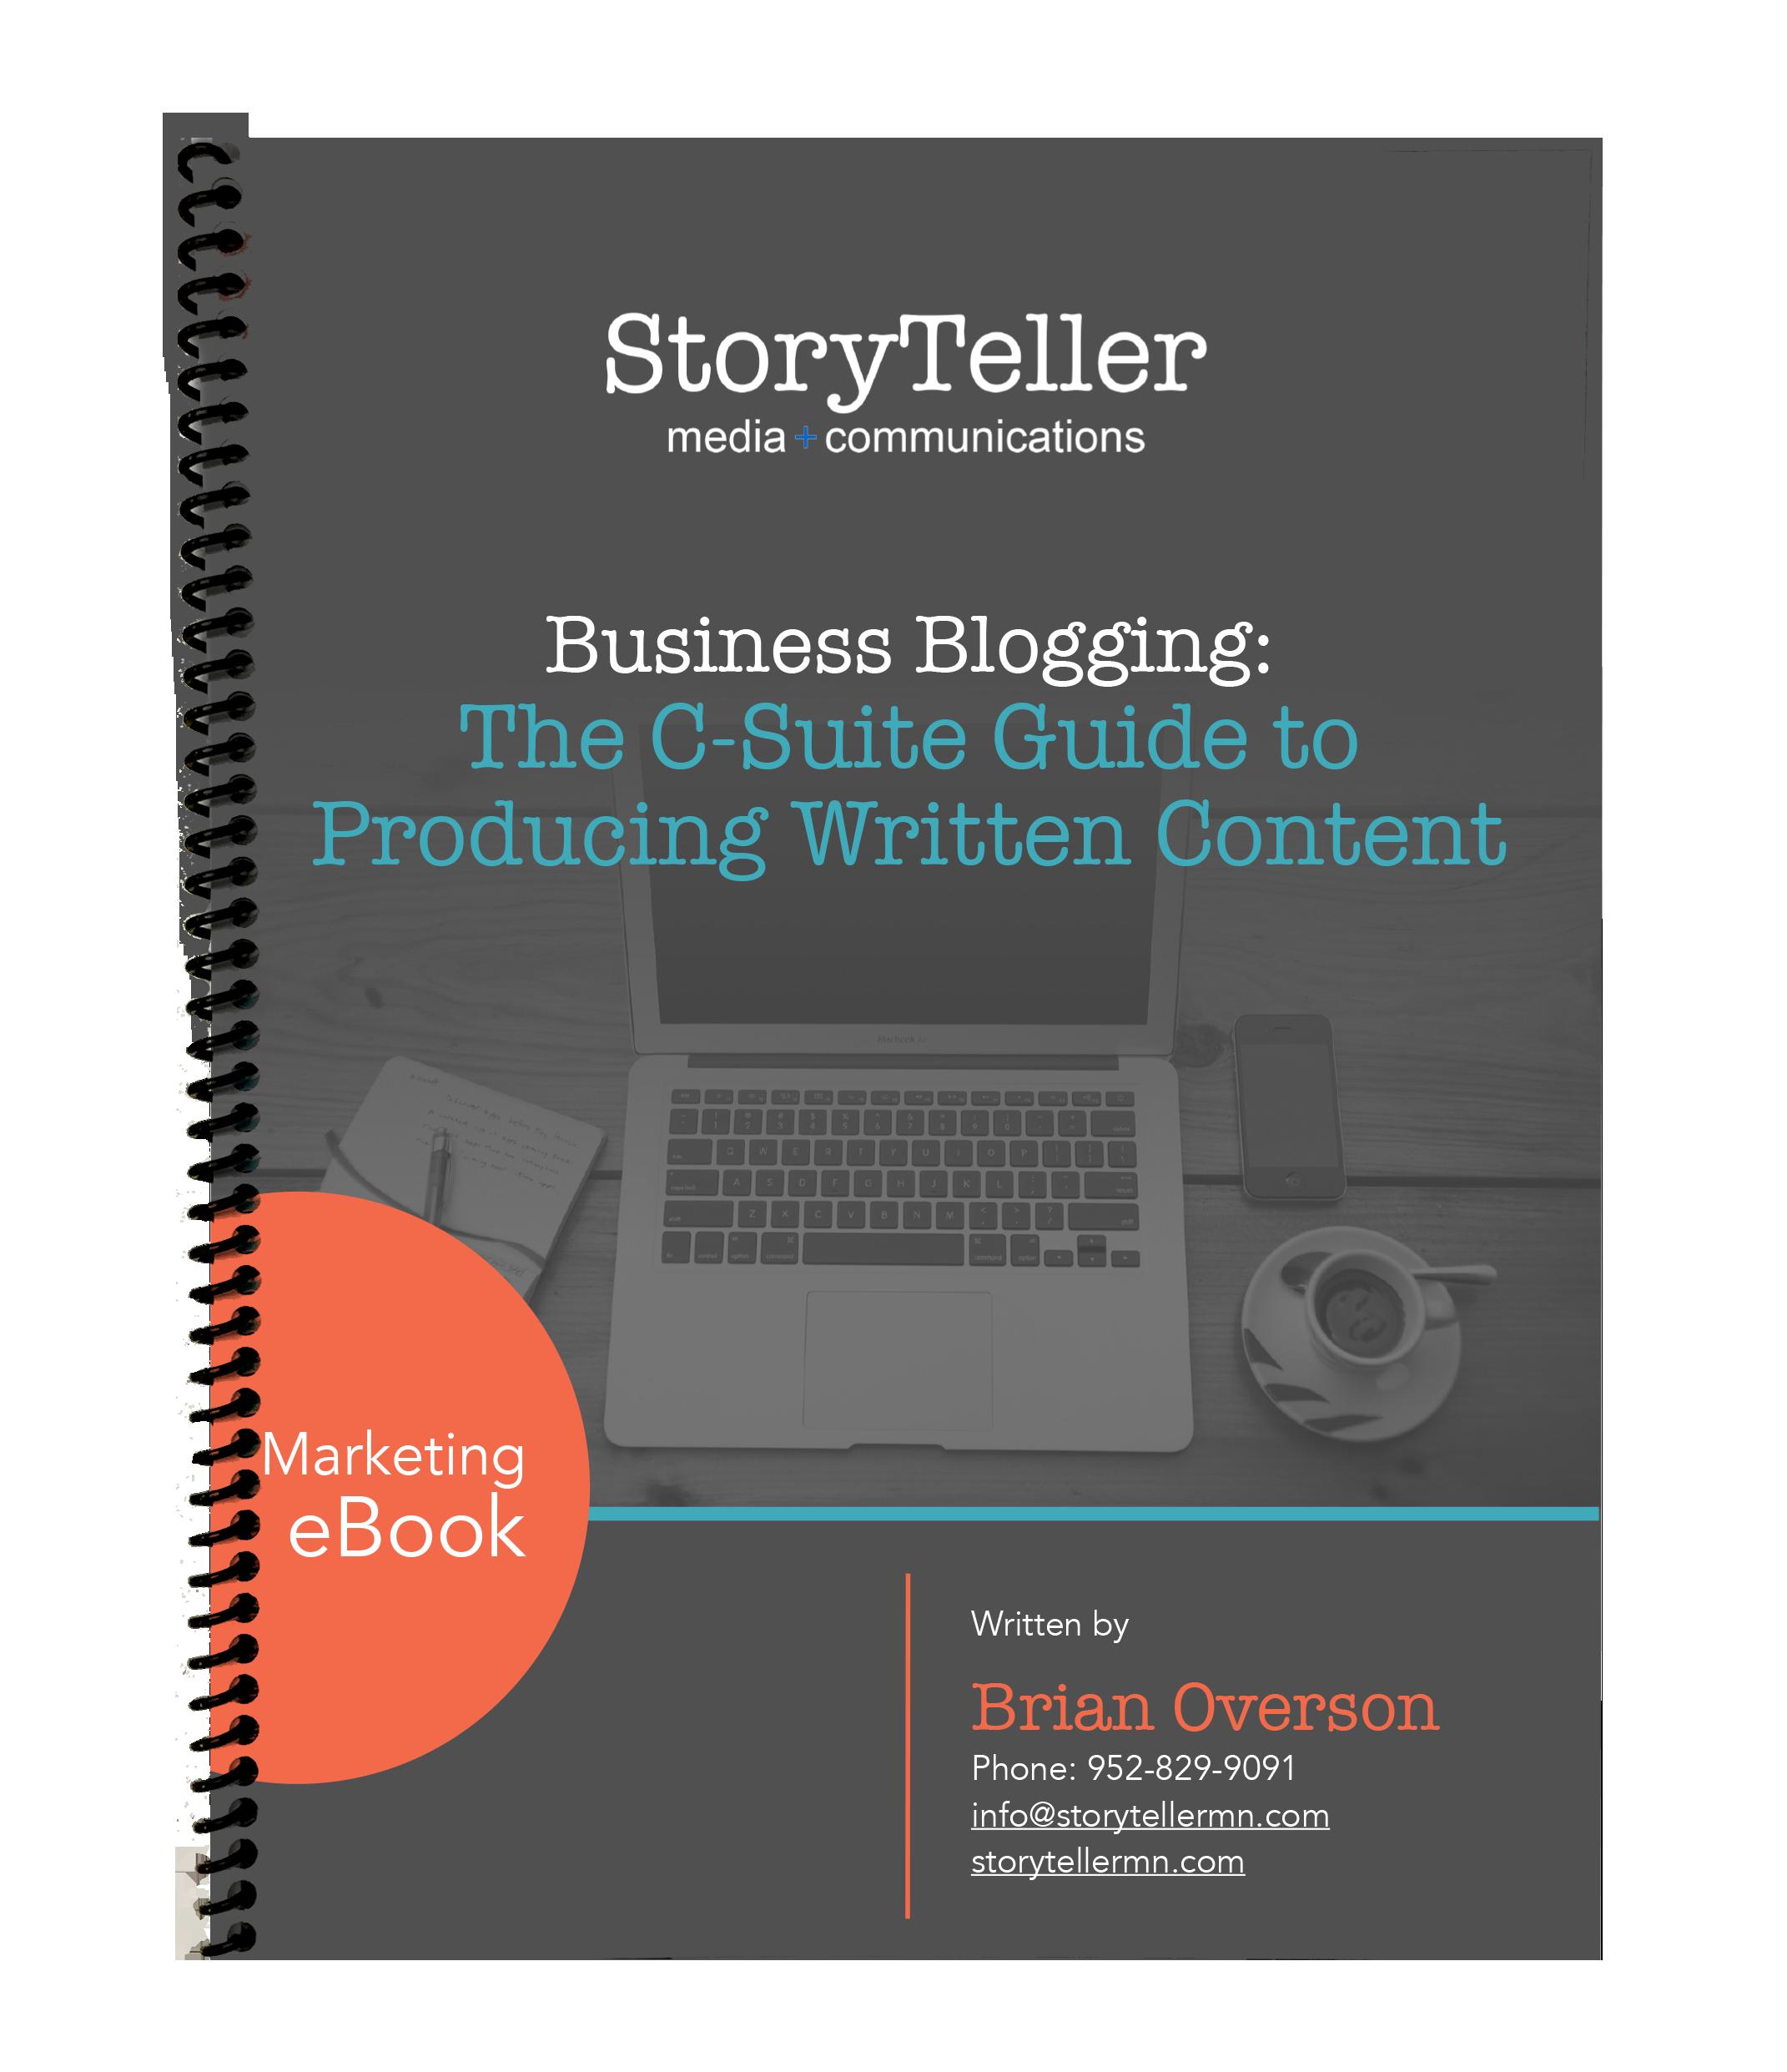 BusinessBlogging